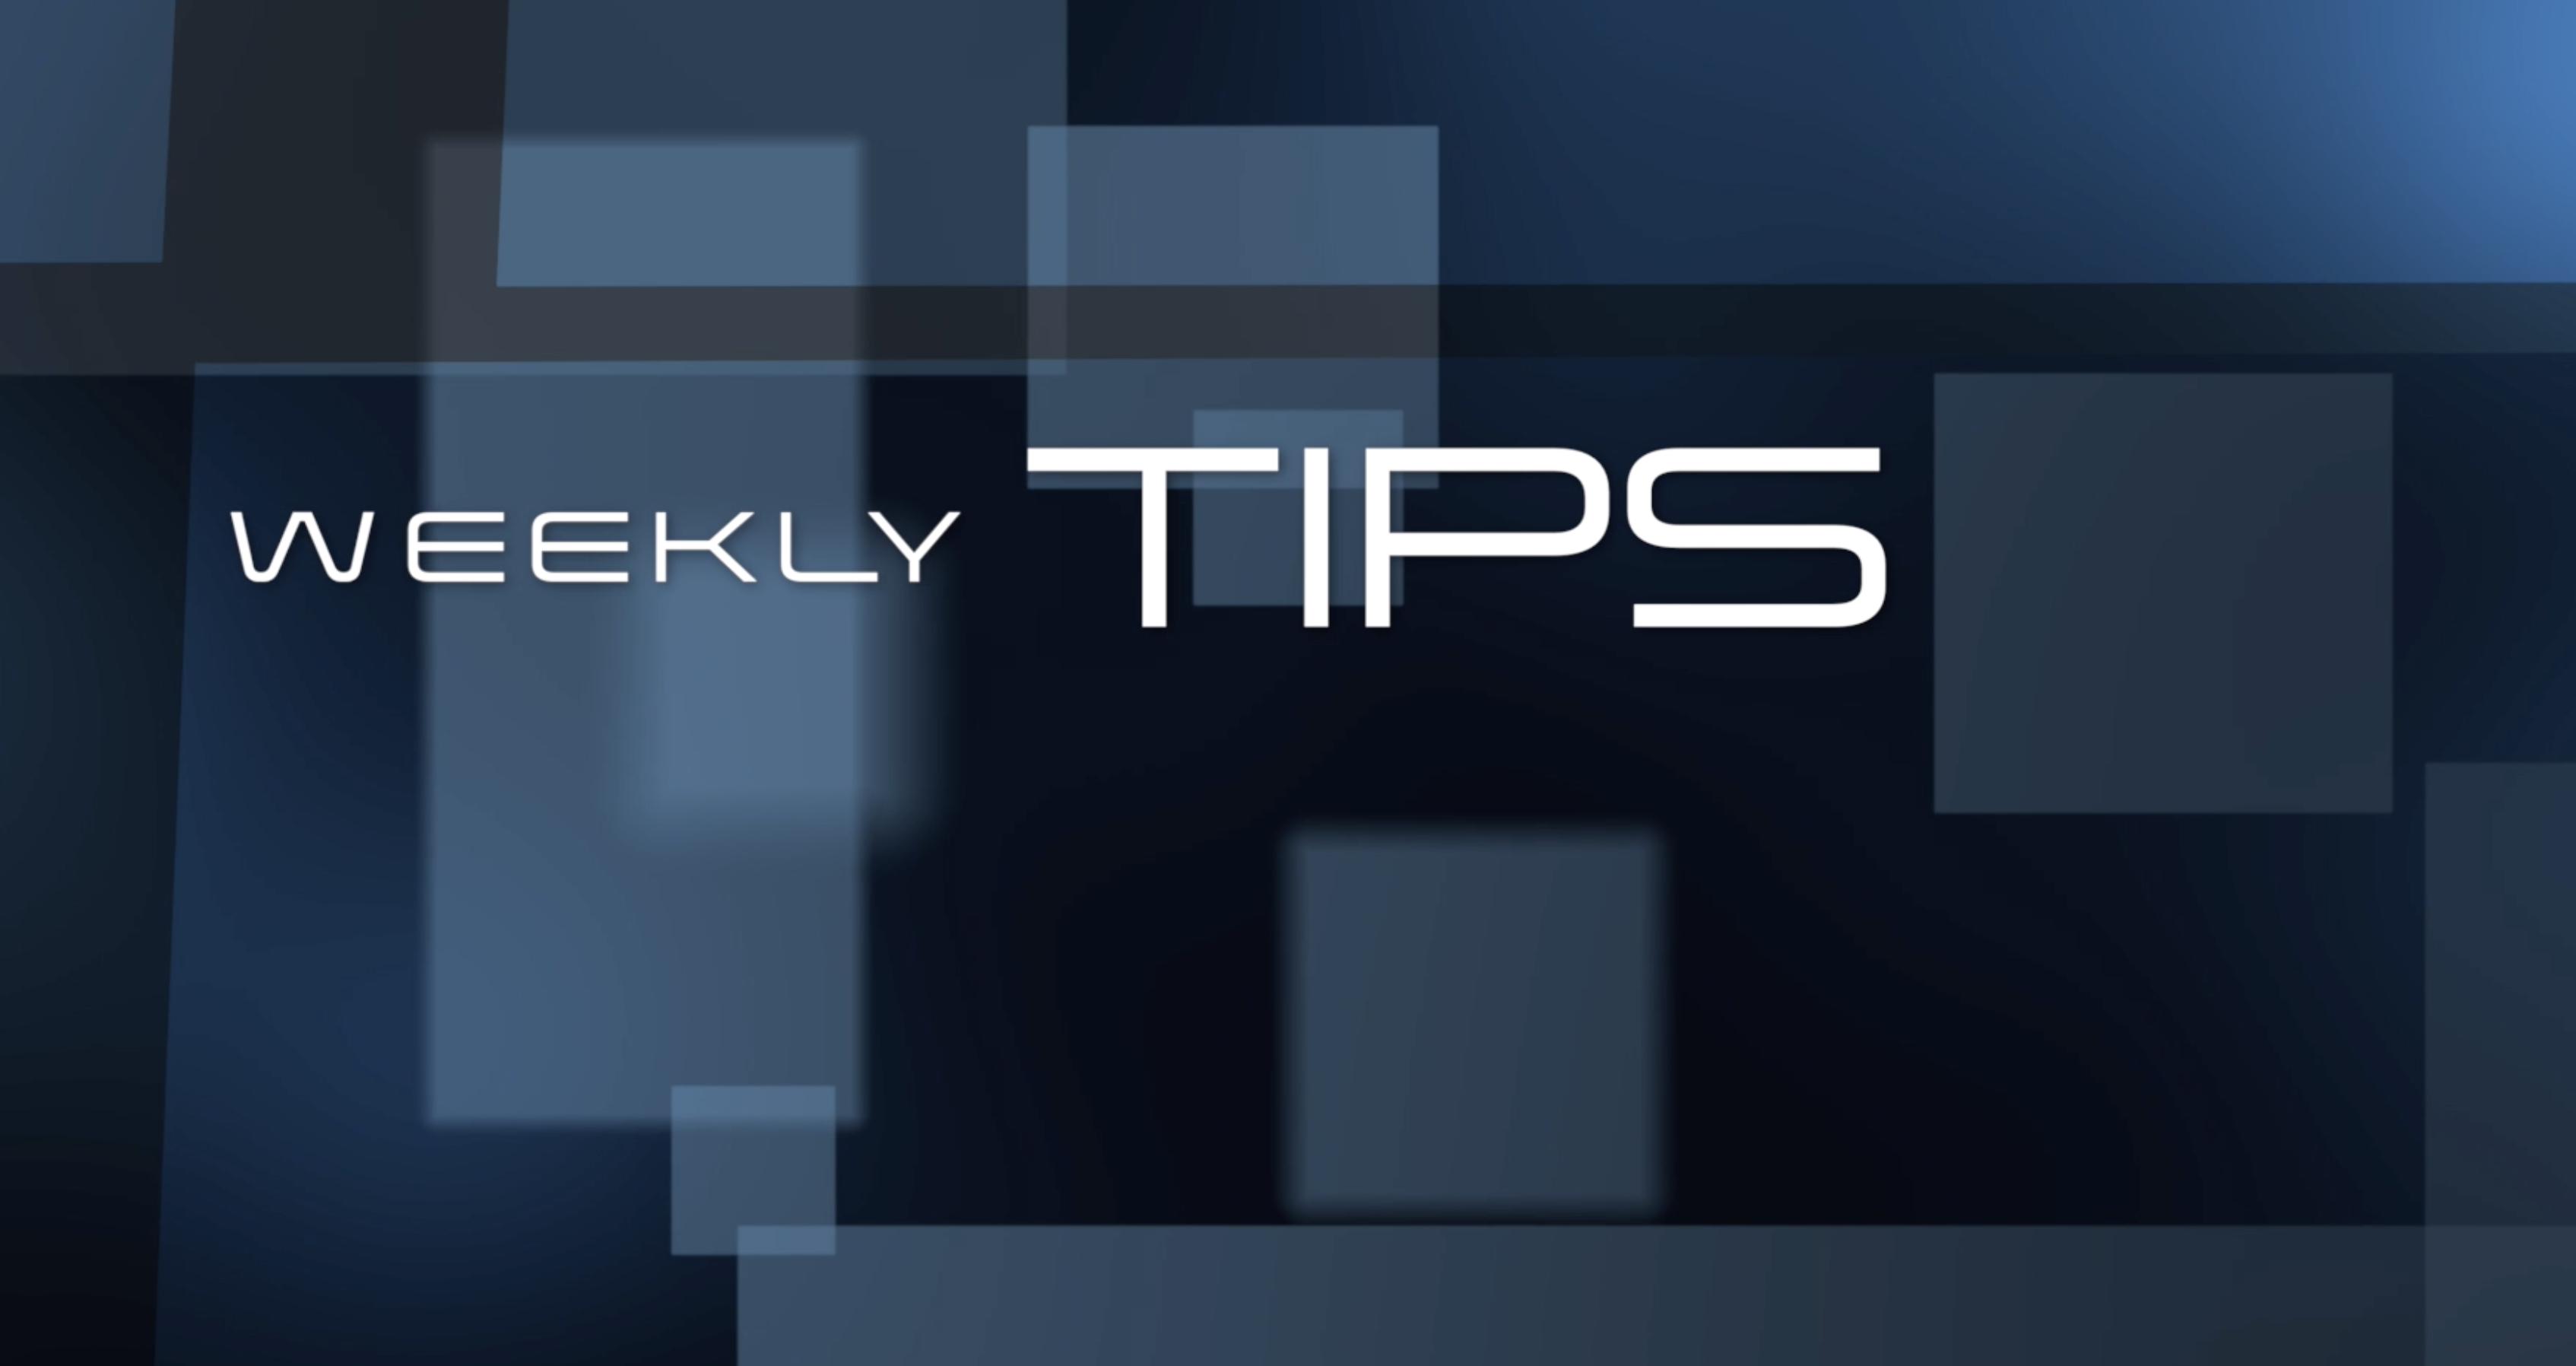 Consigli settimanali